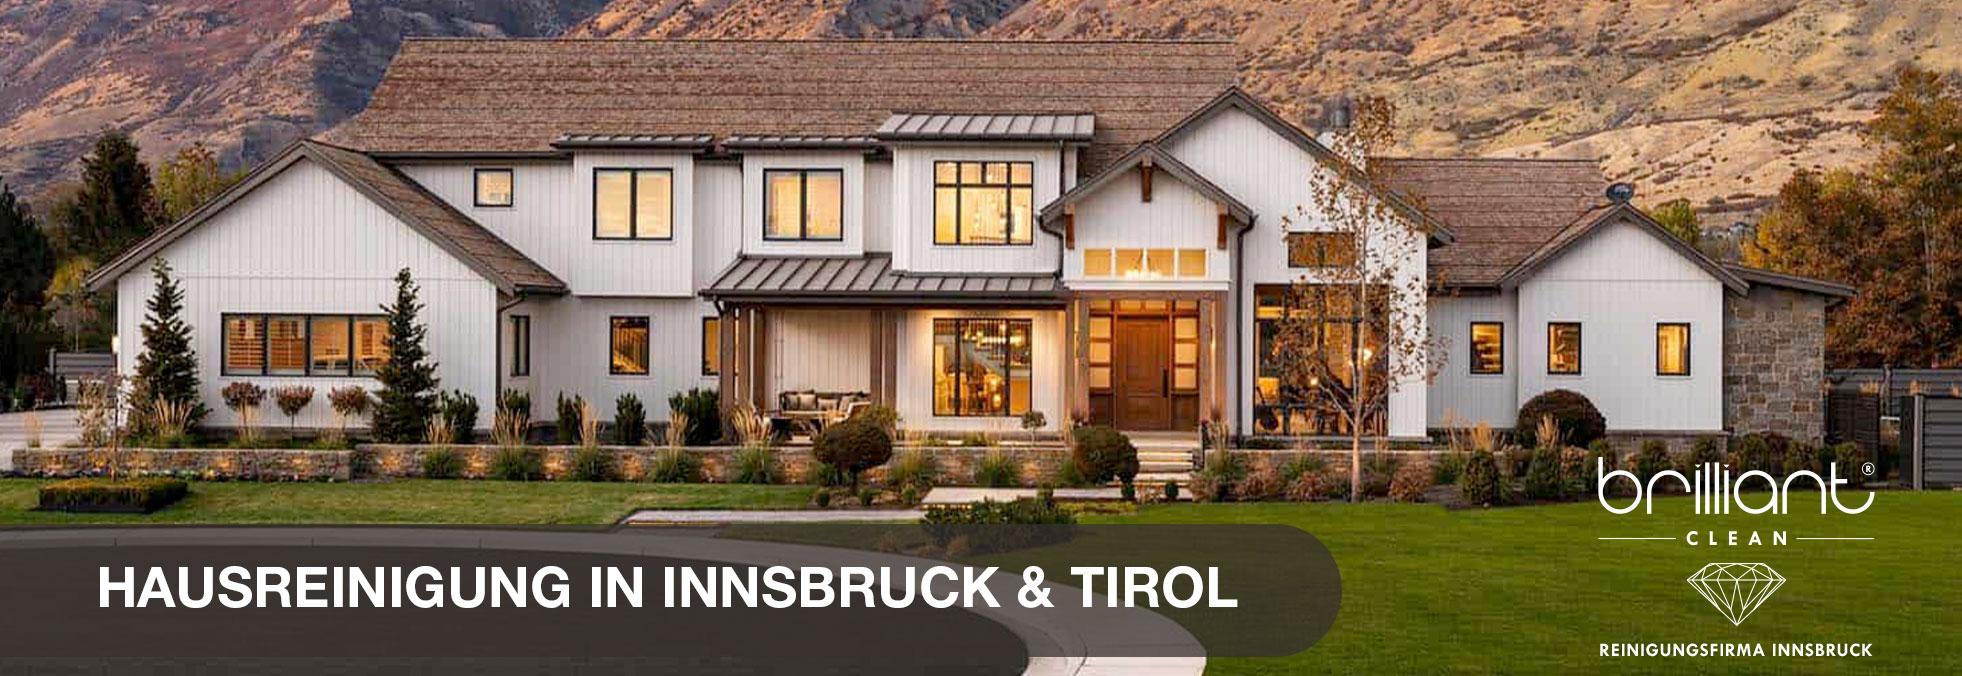 hausreinigung-innsbruck-tirol-brilliant-clean